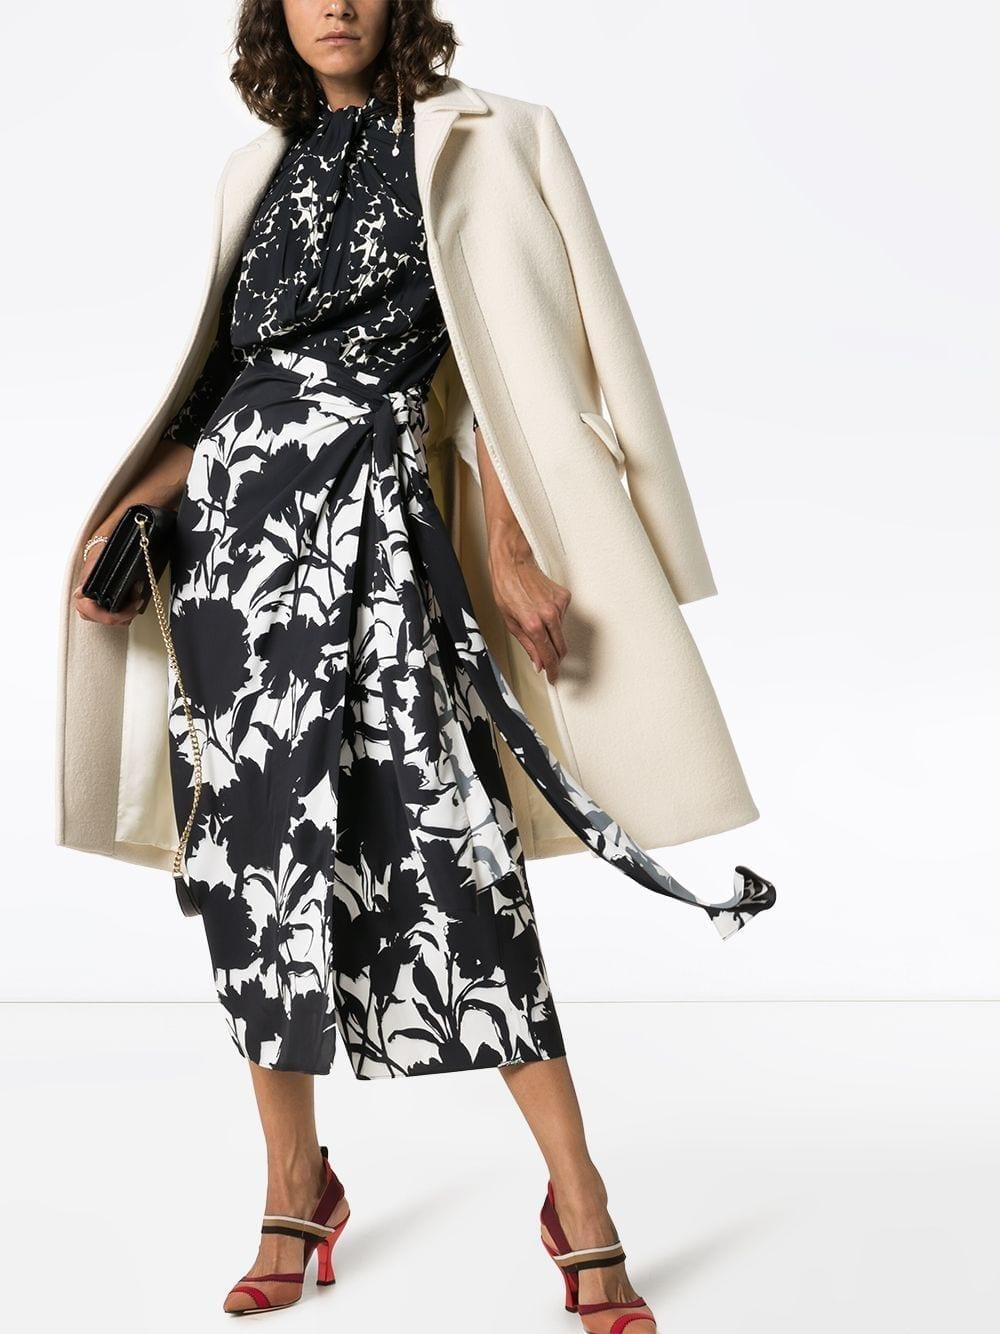 PRADA Floral Print Tie Neck Dress